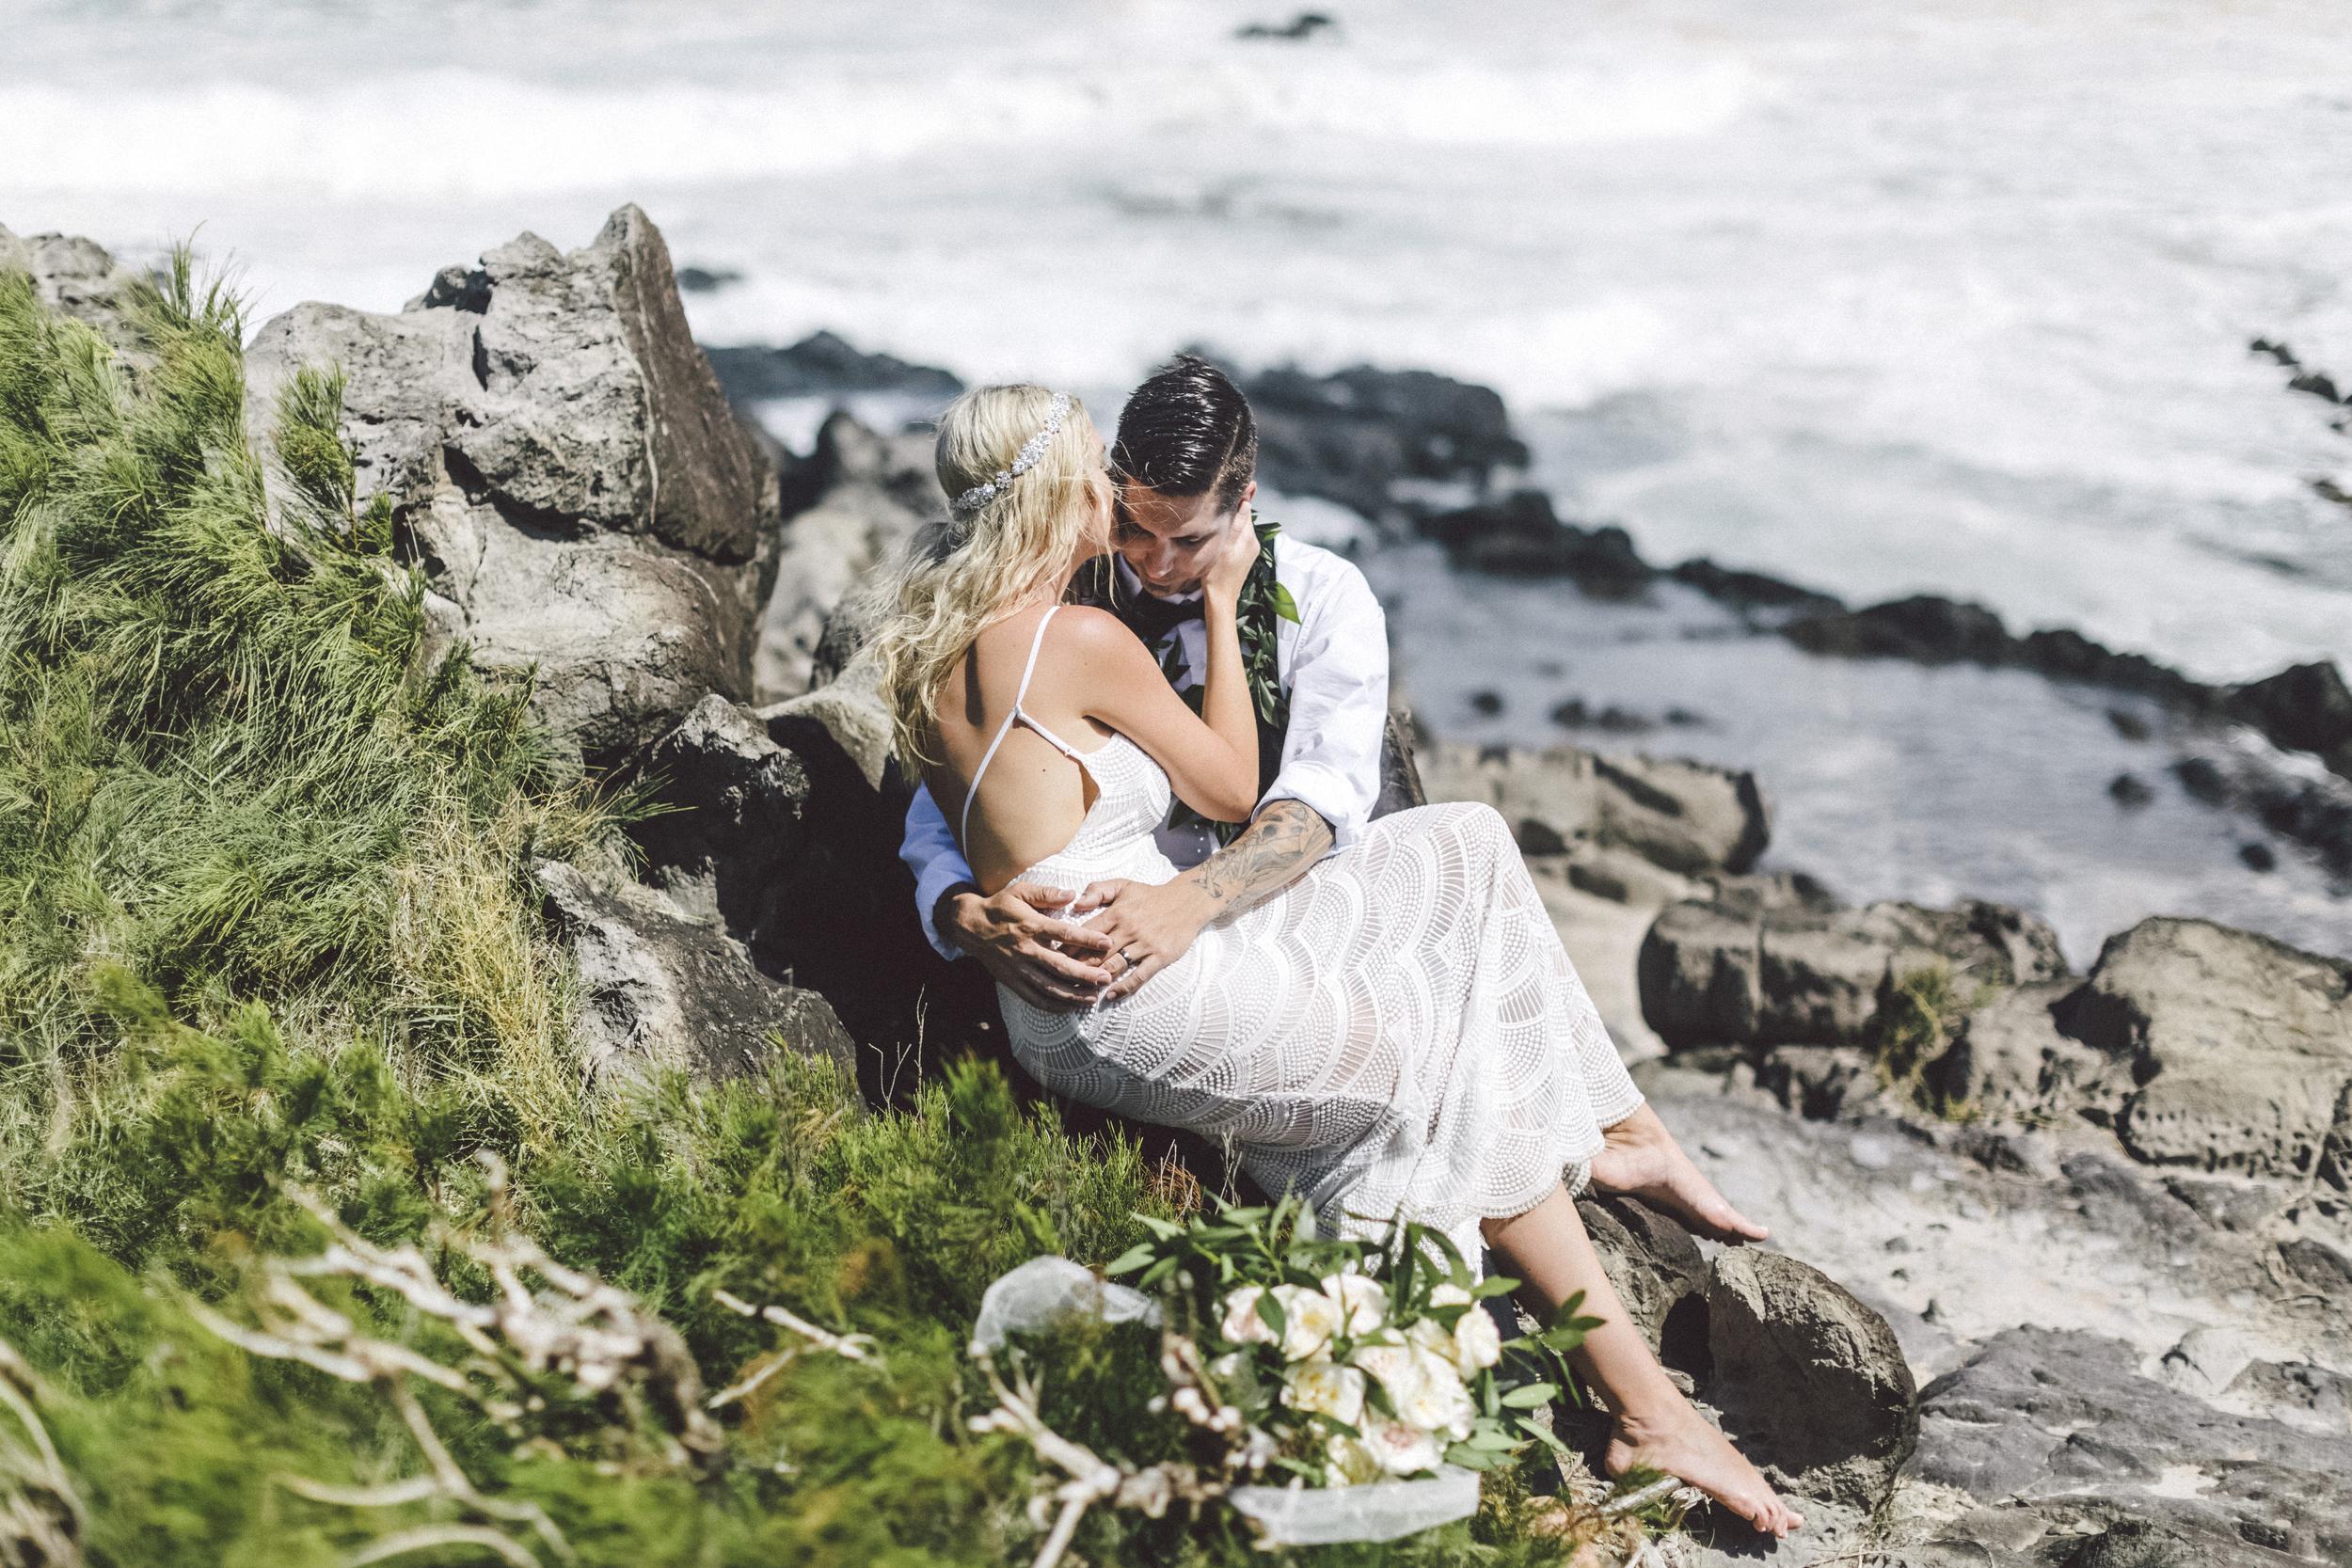 angie-diaz-photography-hawaii-wedding-52.jpg